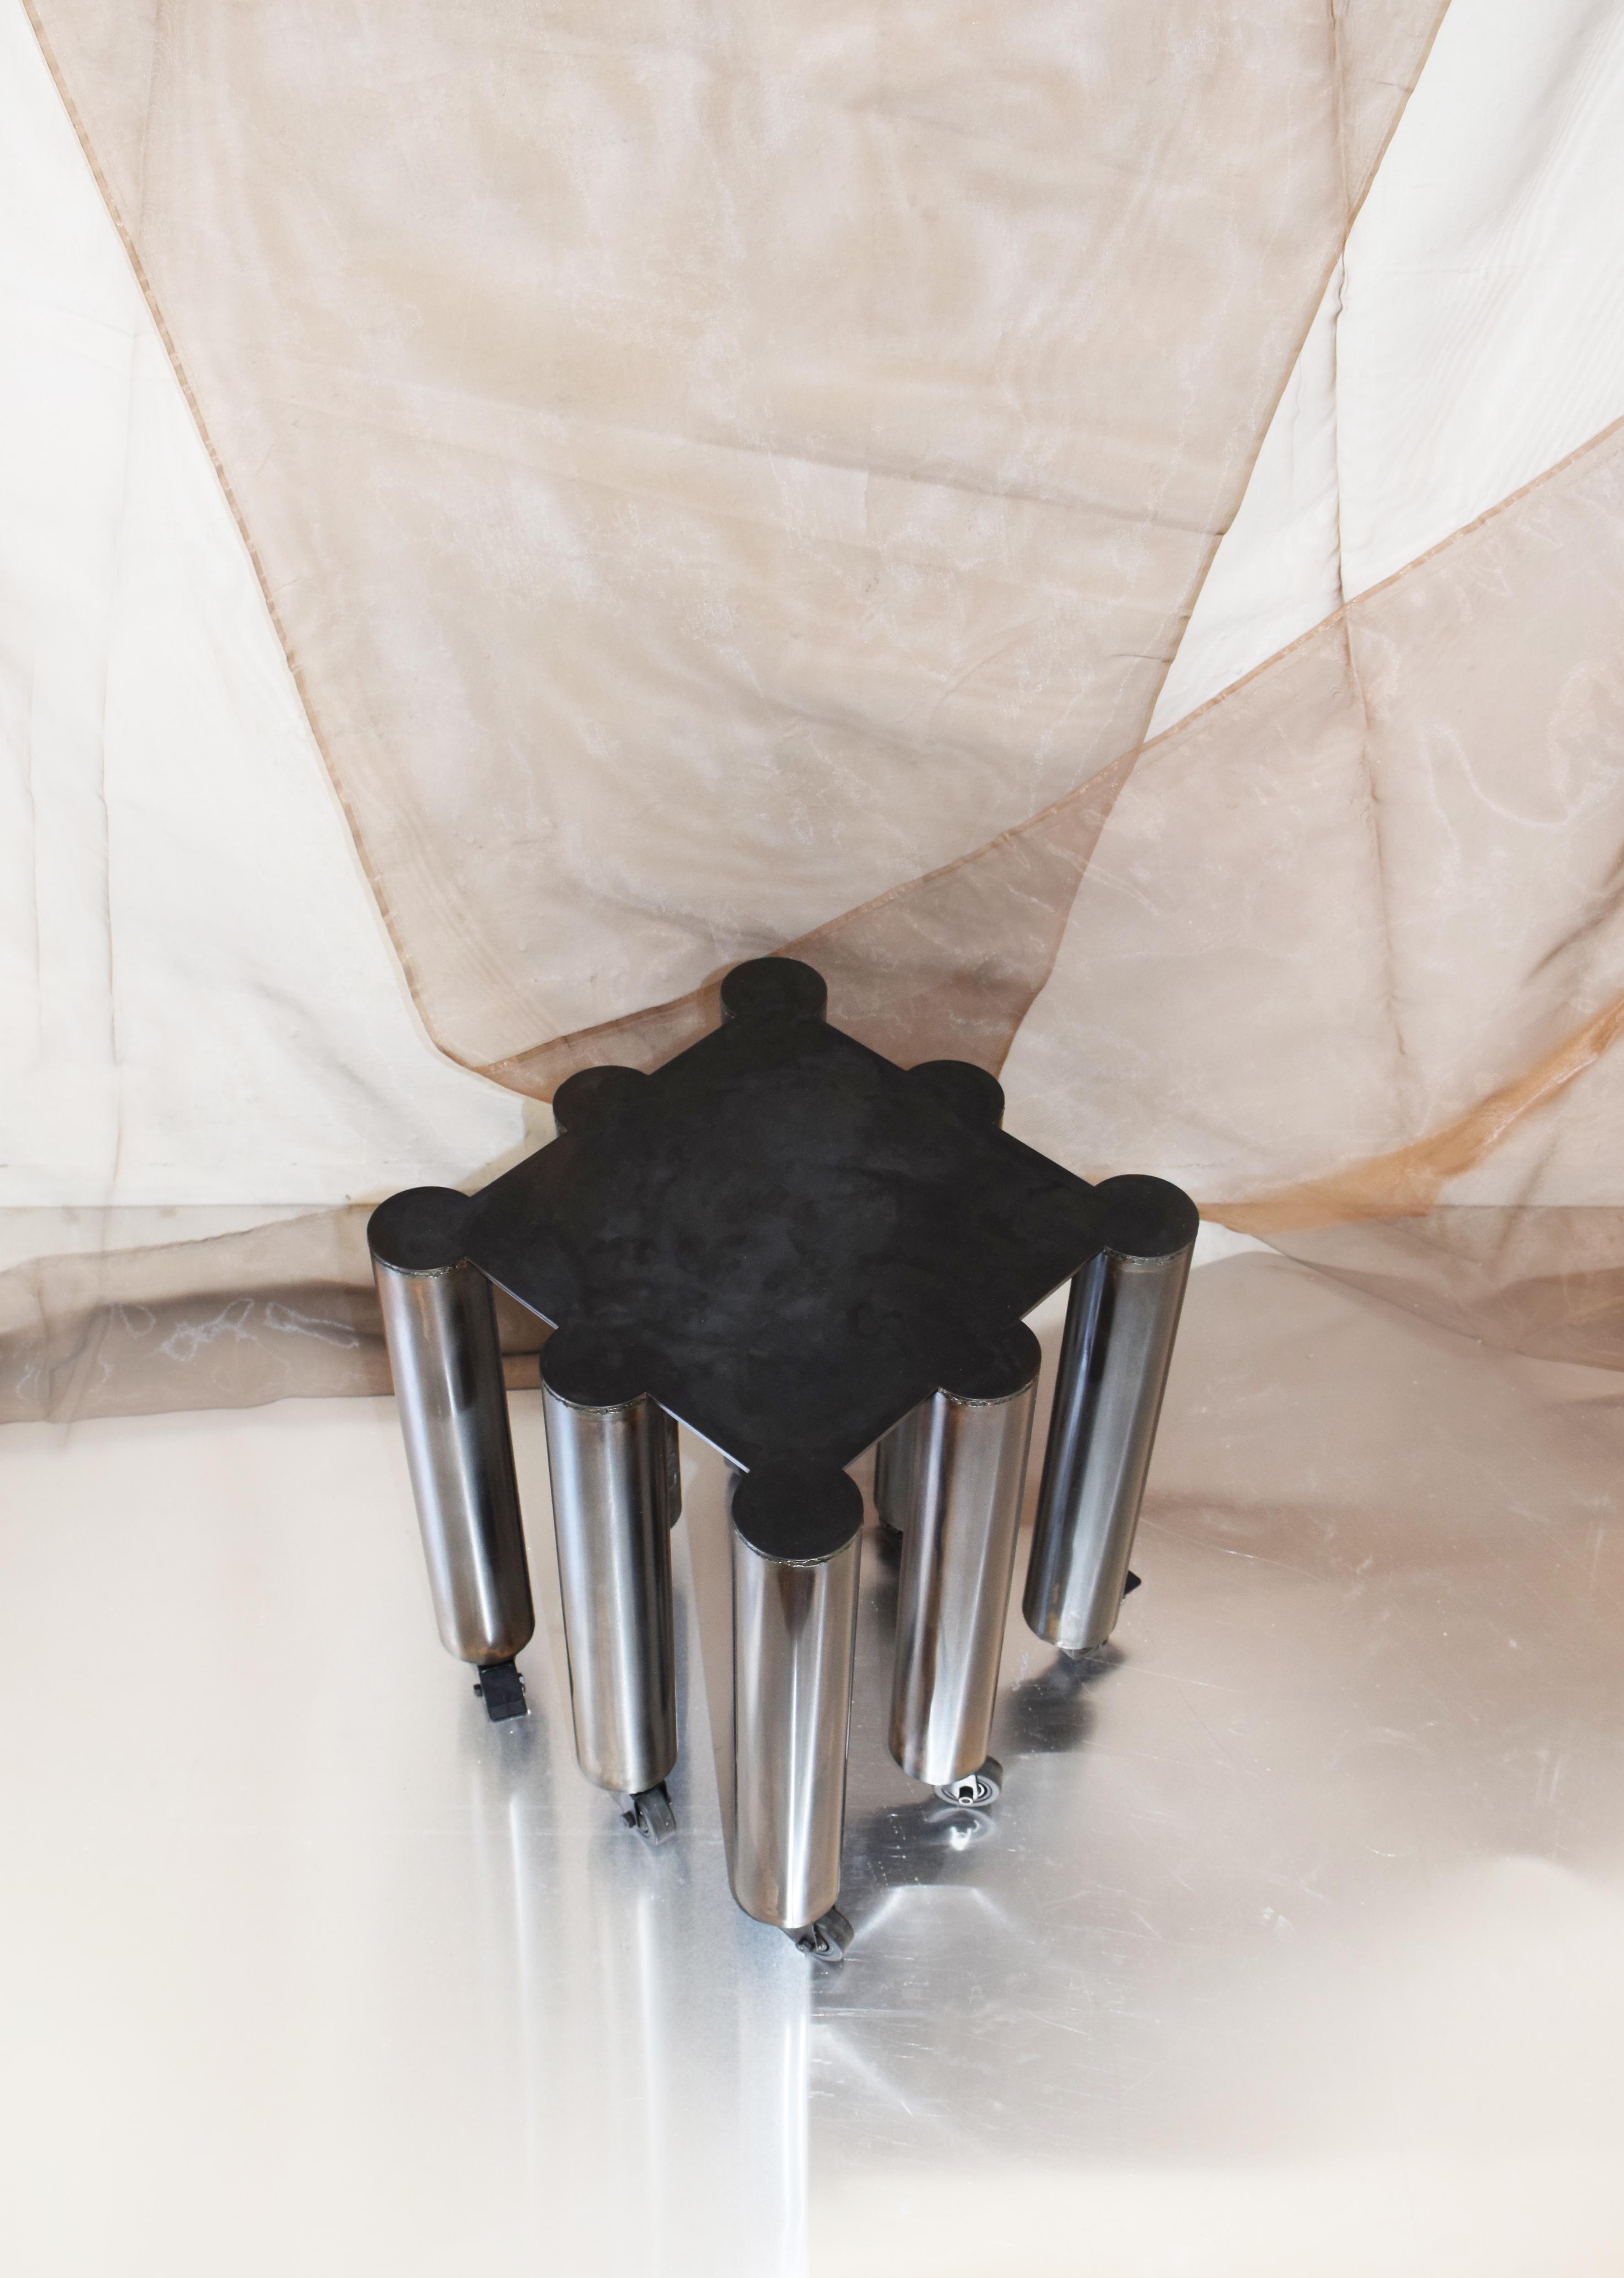 8 Legged Stool on Wheels par Wendy Andreu